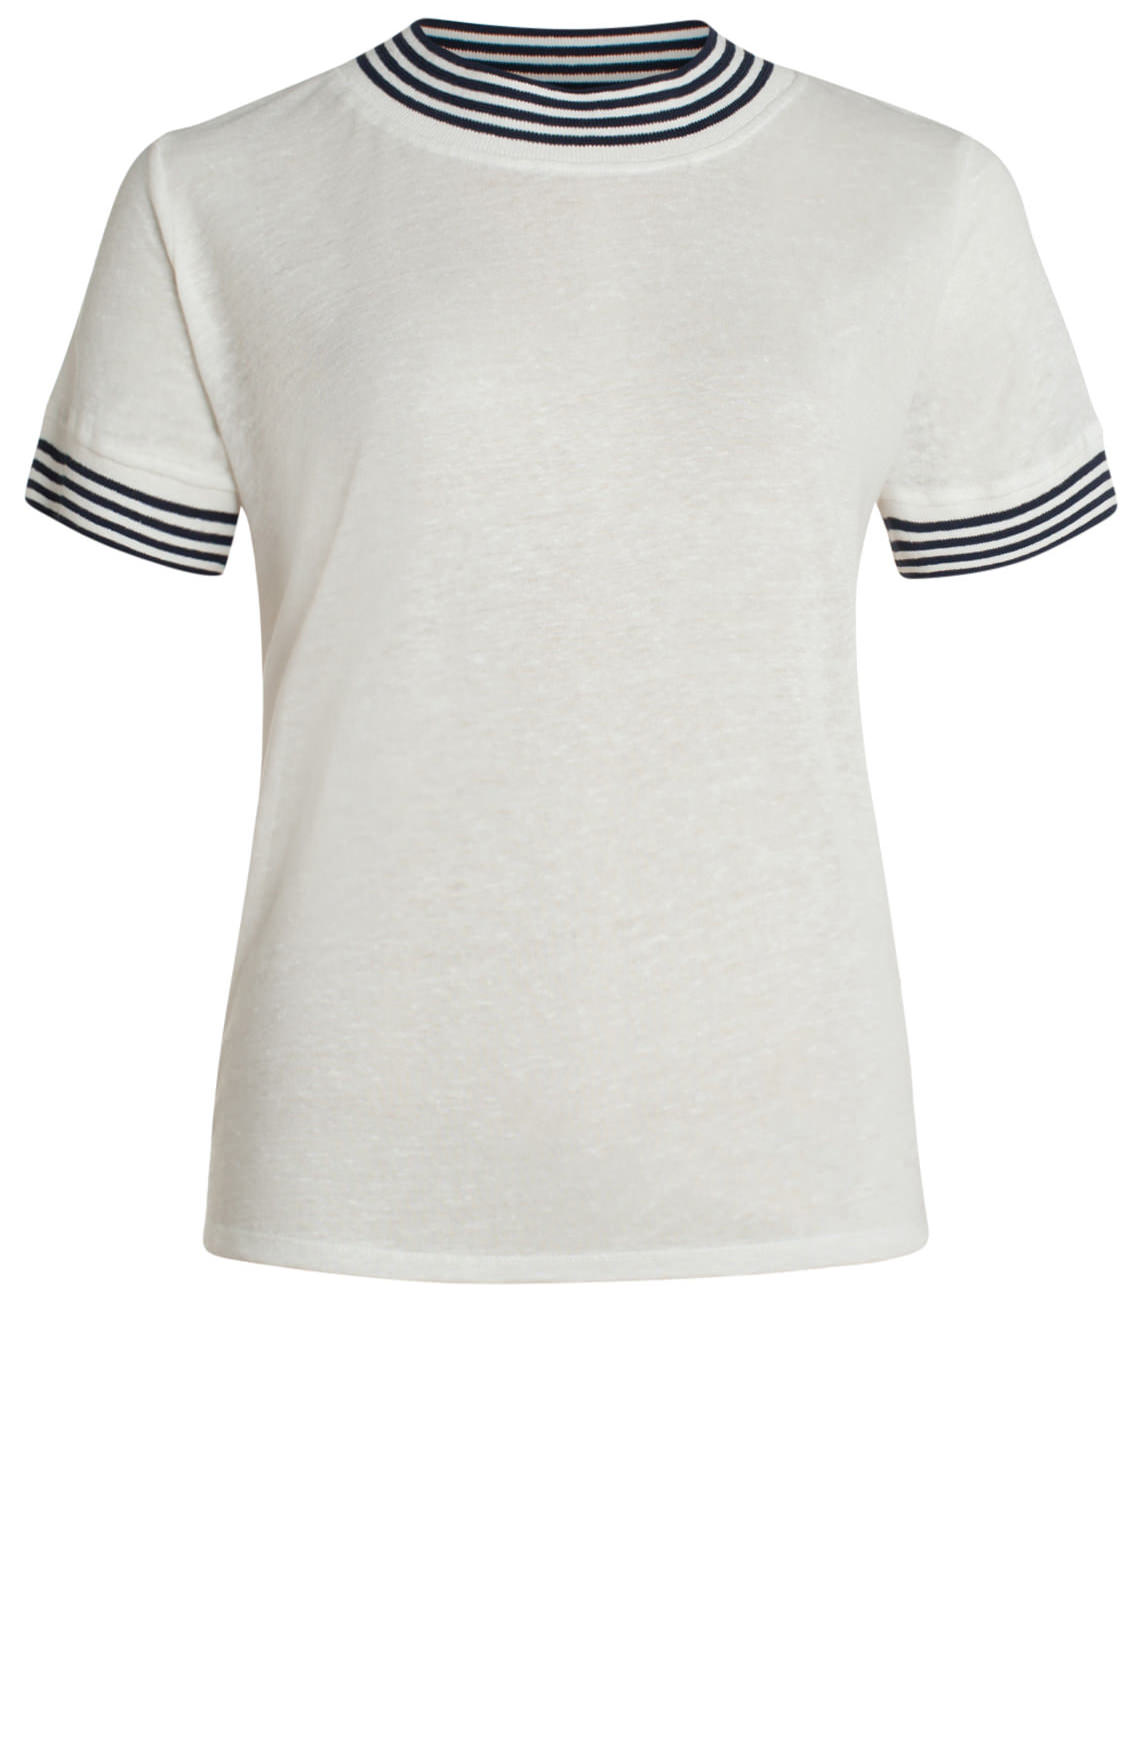 Anna Dames Linnen shirt met hoge hals wit